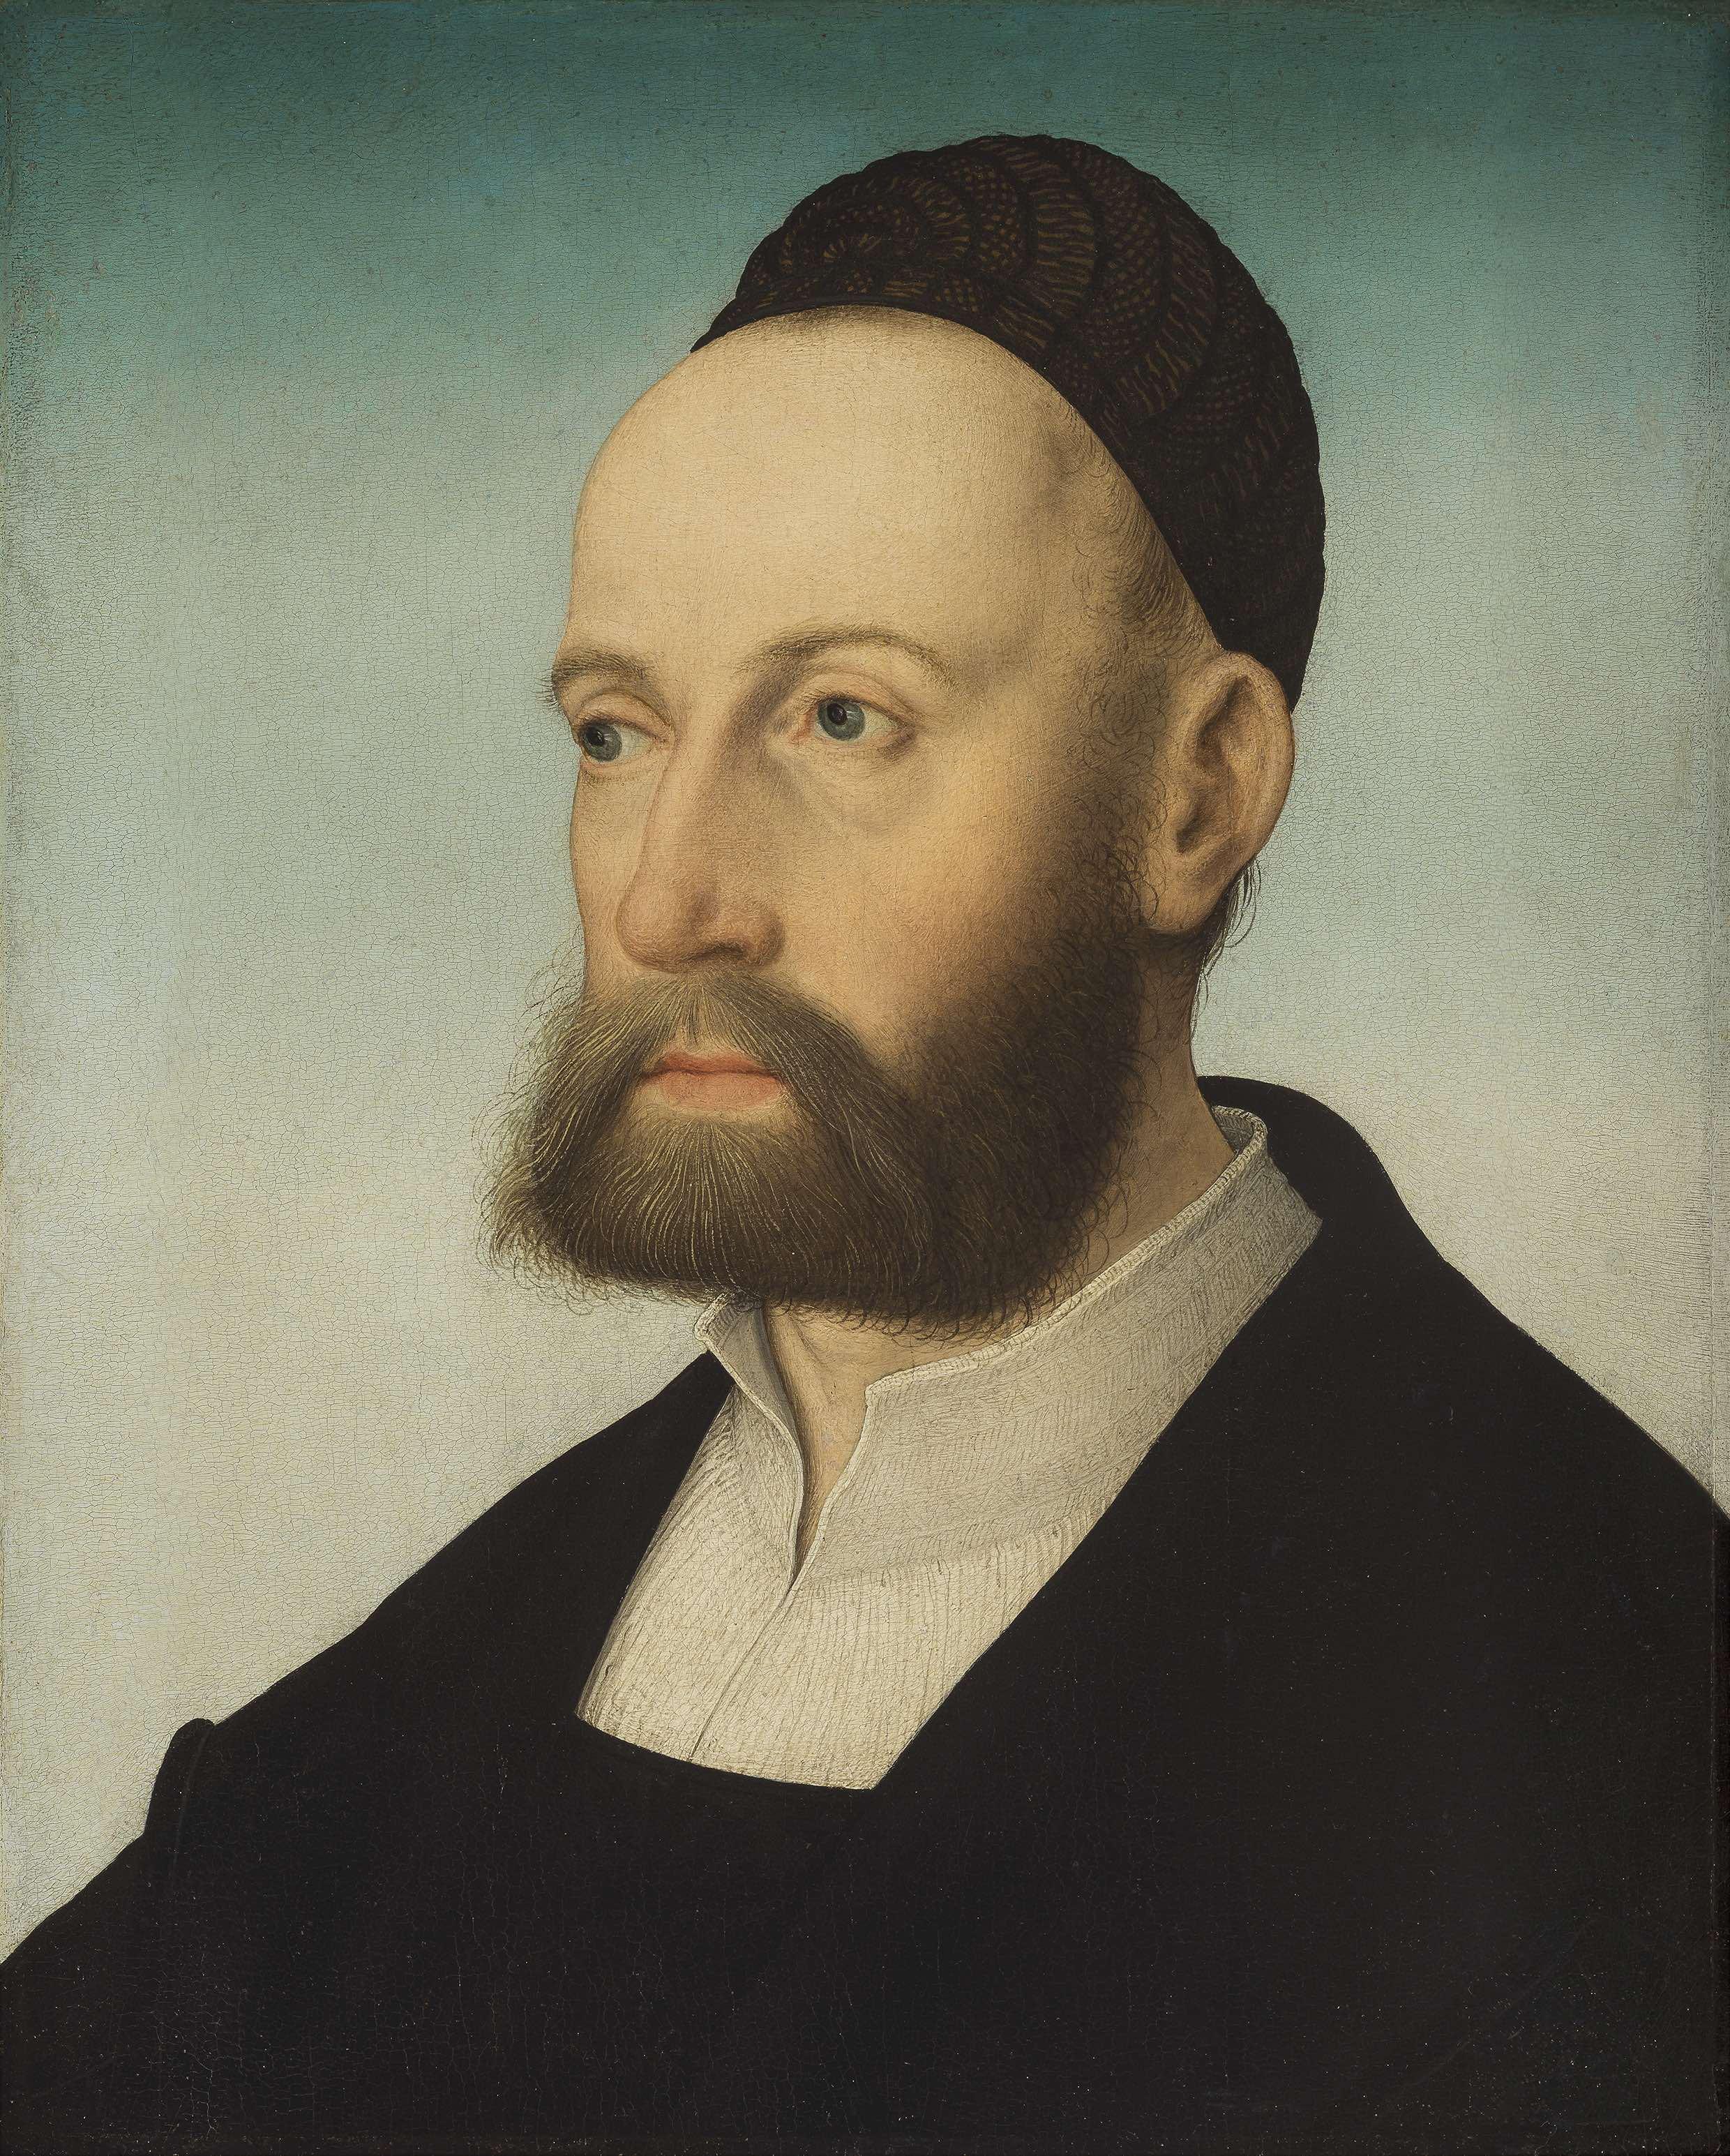 Hans Maler (um 1475/80 – um 1526/29), Ulrich Fugger der Jüngere, 1525, Holz, 41,5 x 35,3 cm. Leihgabe aus Privatbesitz, Inv.-Nr. L 2724, Foto: Privat.